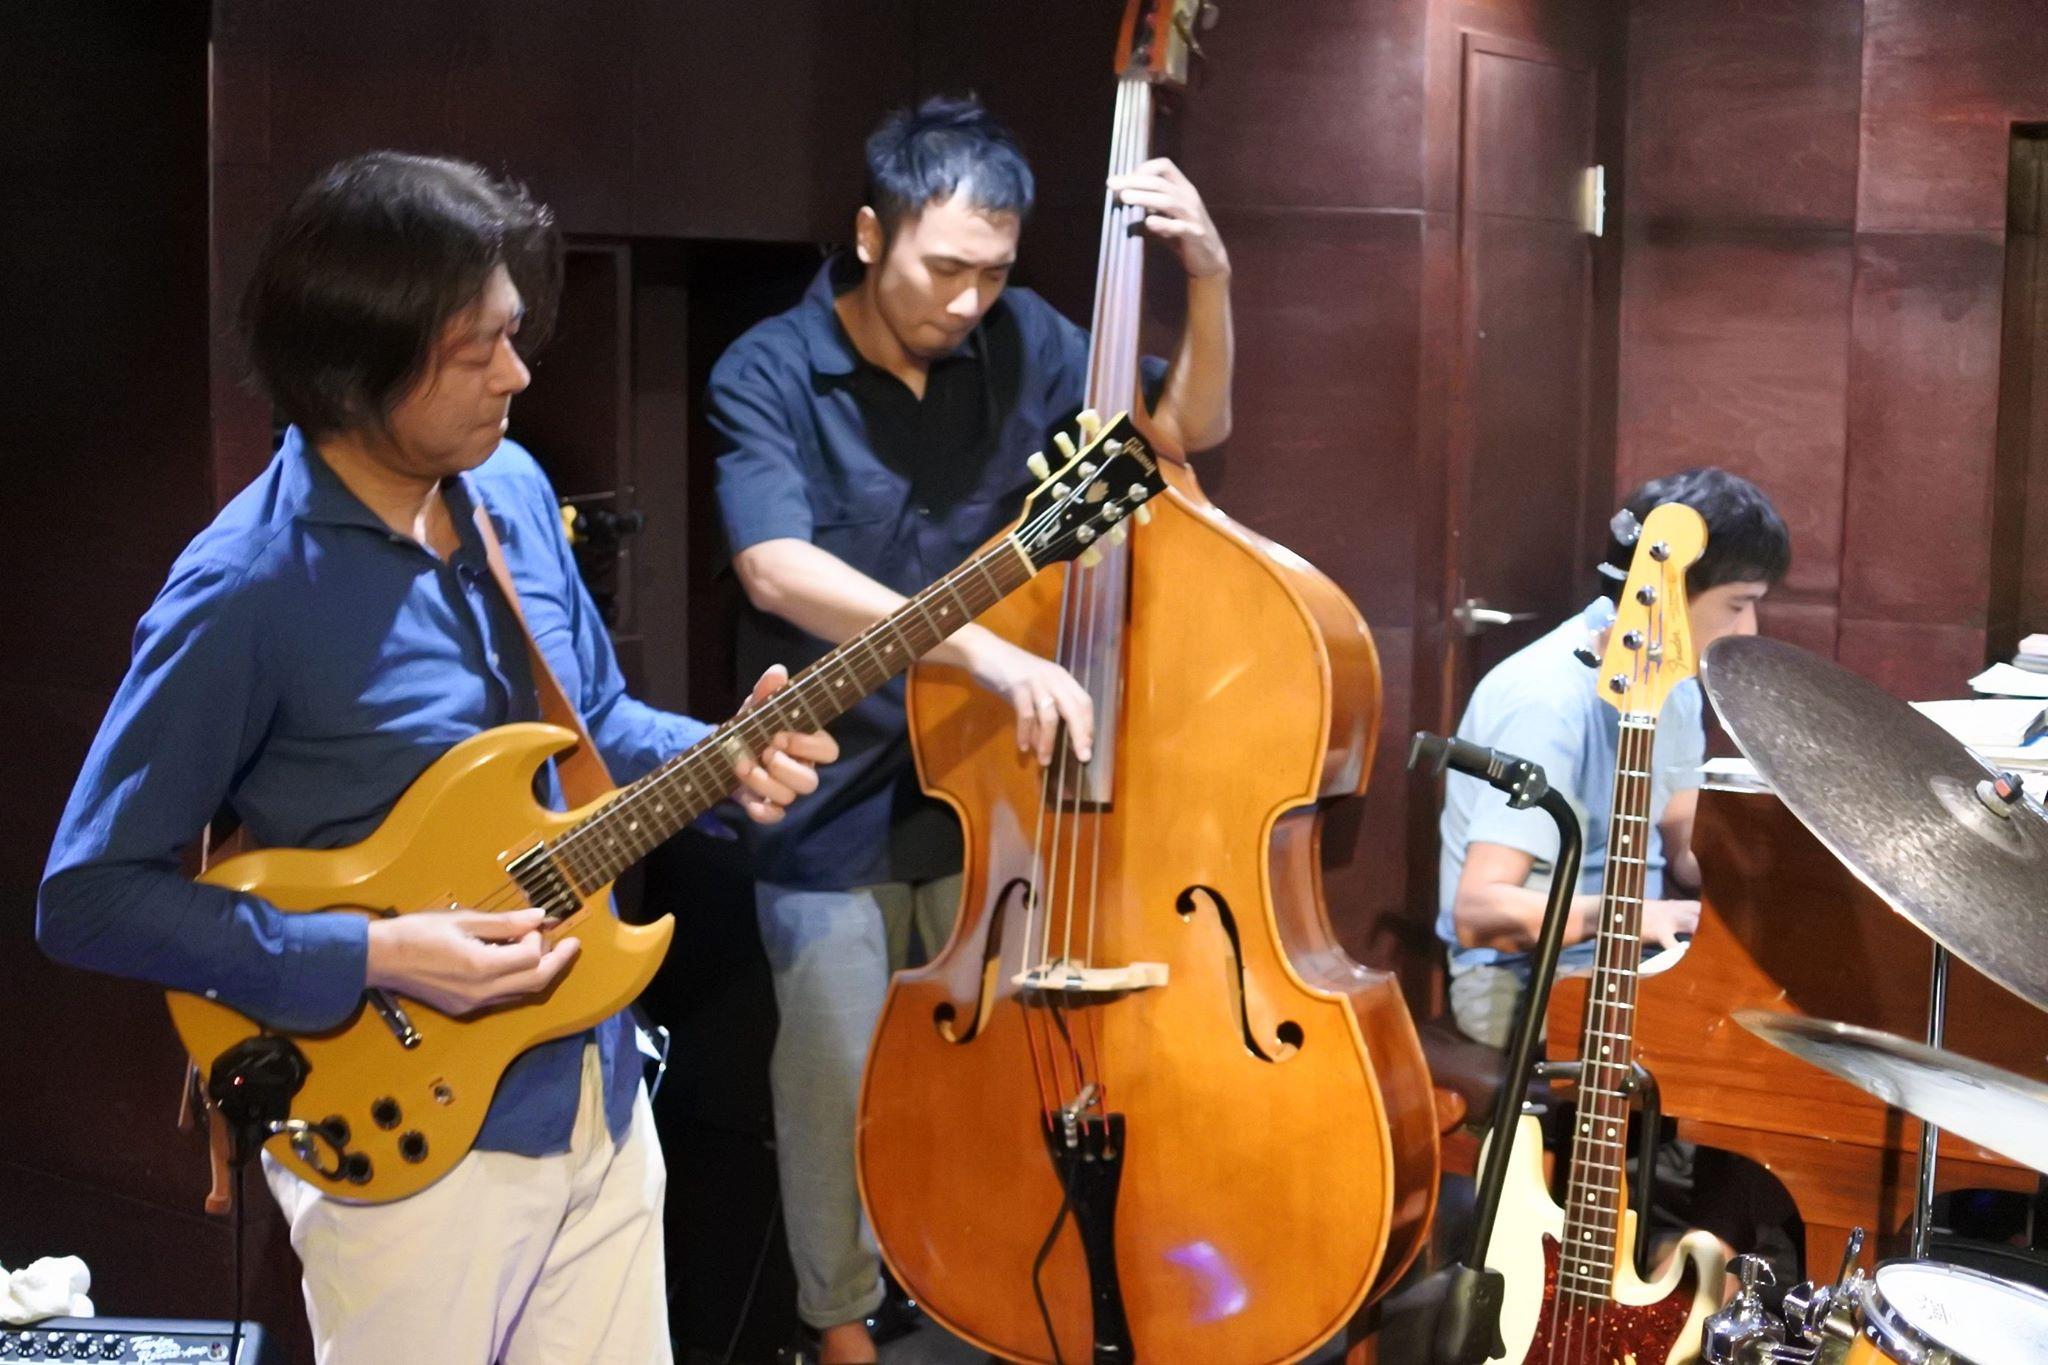 bandband.jpg